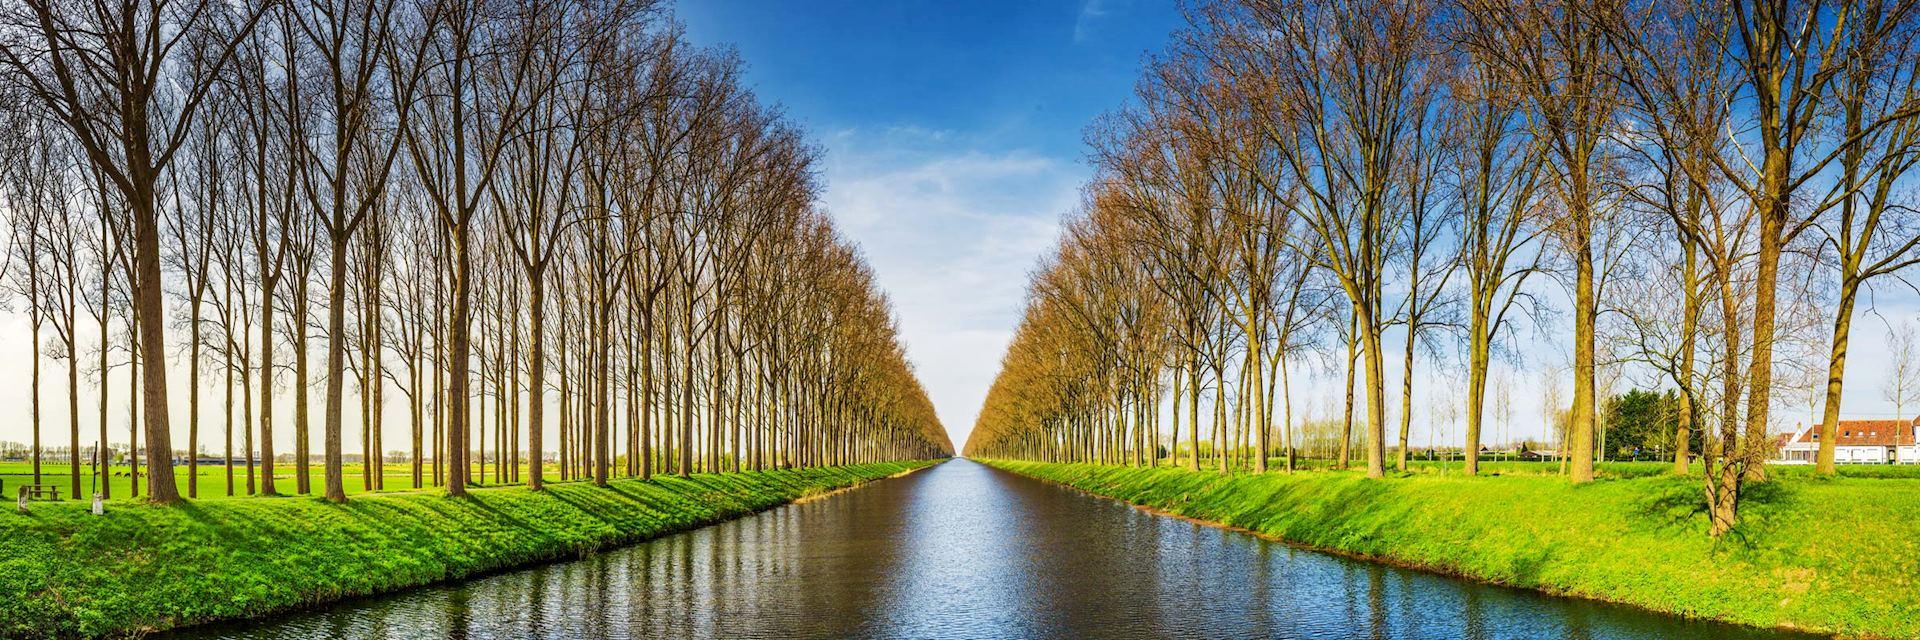 Damme Canal, Flanders, Belgium